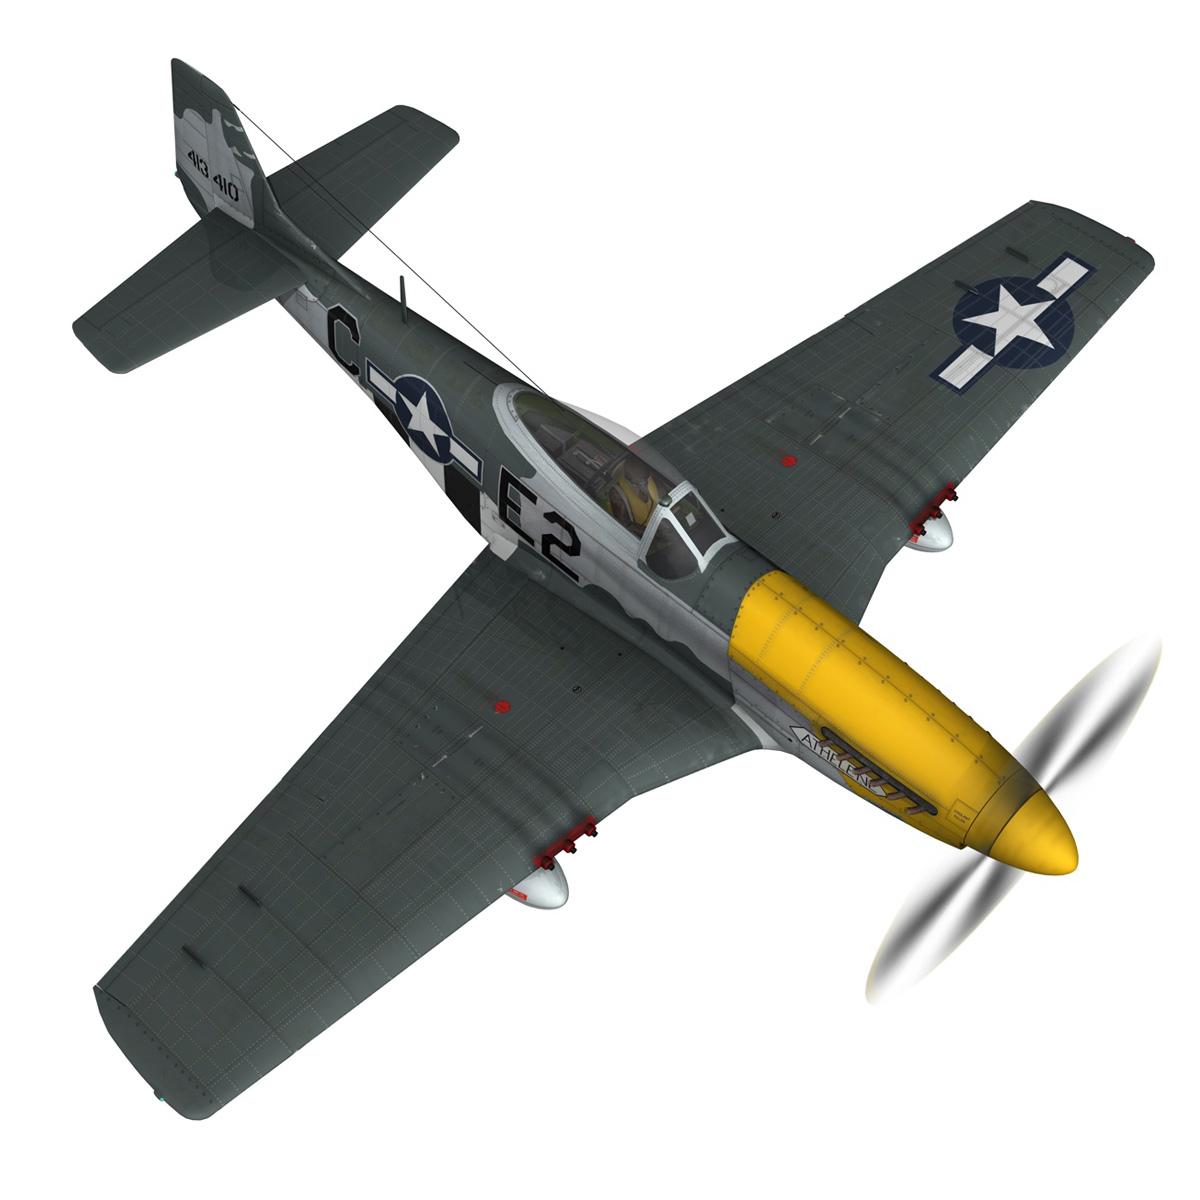 north american p-51d mustang – lou iv 3d model fbx c4d lwo obj 272605